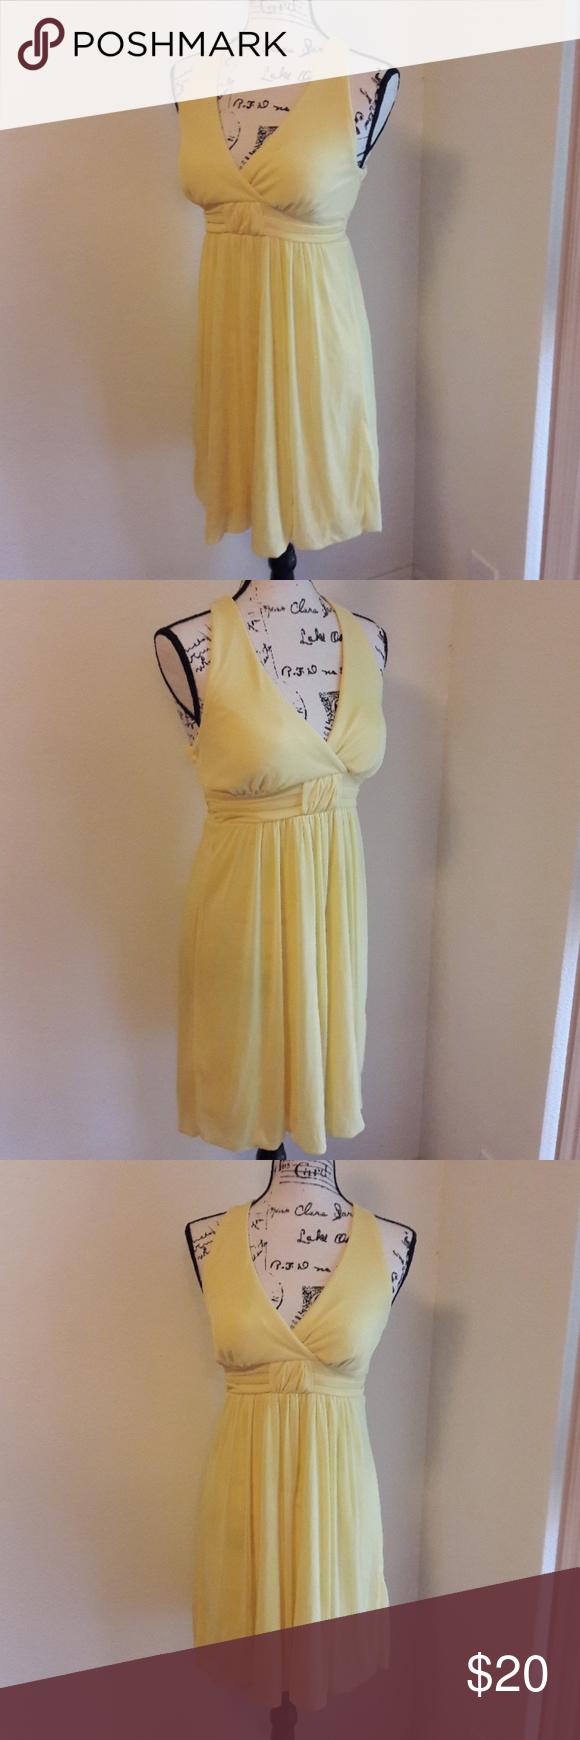 Maurice Dress Maurices Dresses Dresses Clothes Design [ 1740 x 580 Pixel ]